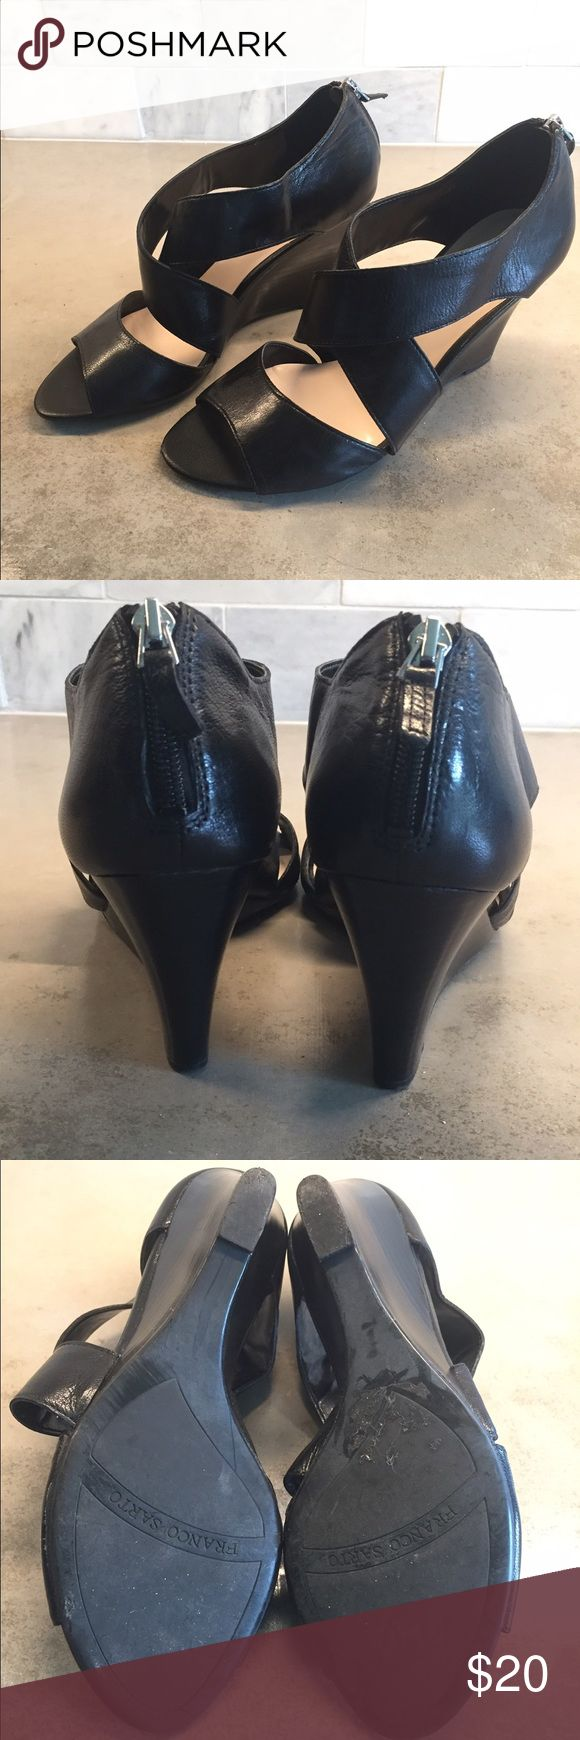 Franco Sarto Black Wedge Sandal Franco Sarto black wedge sandal with back zipper.  No size listed, fit like a 9.  Used once, like new.  No trades. Franco Sarto Shoes Wedges